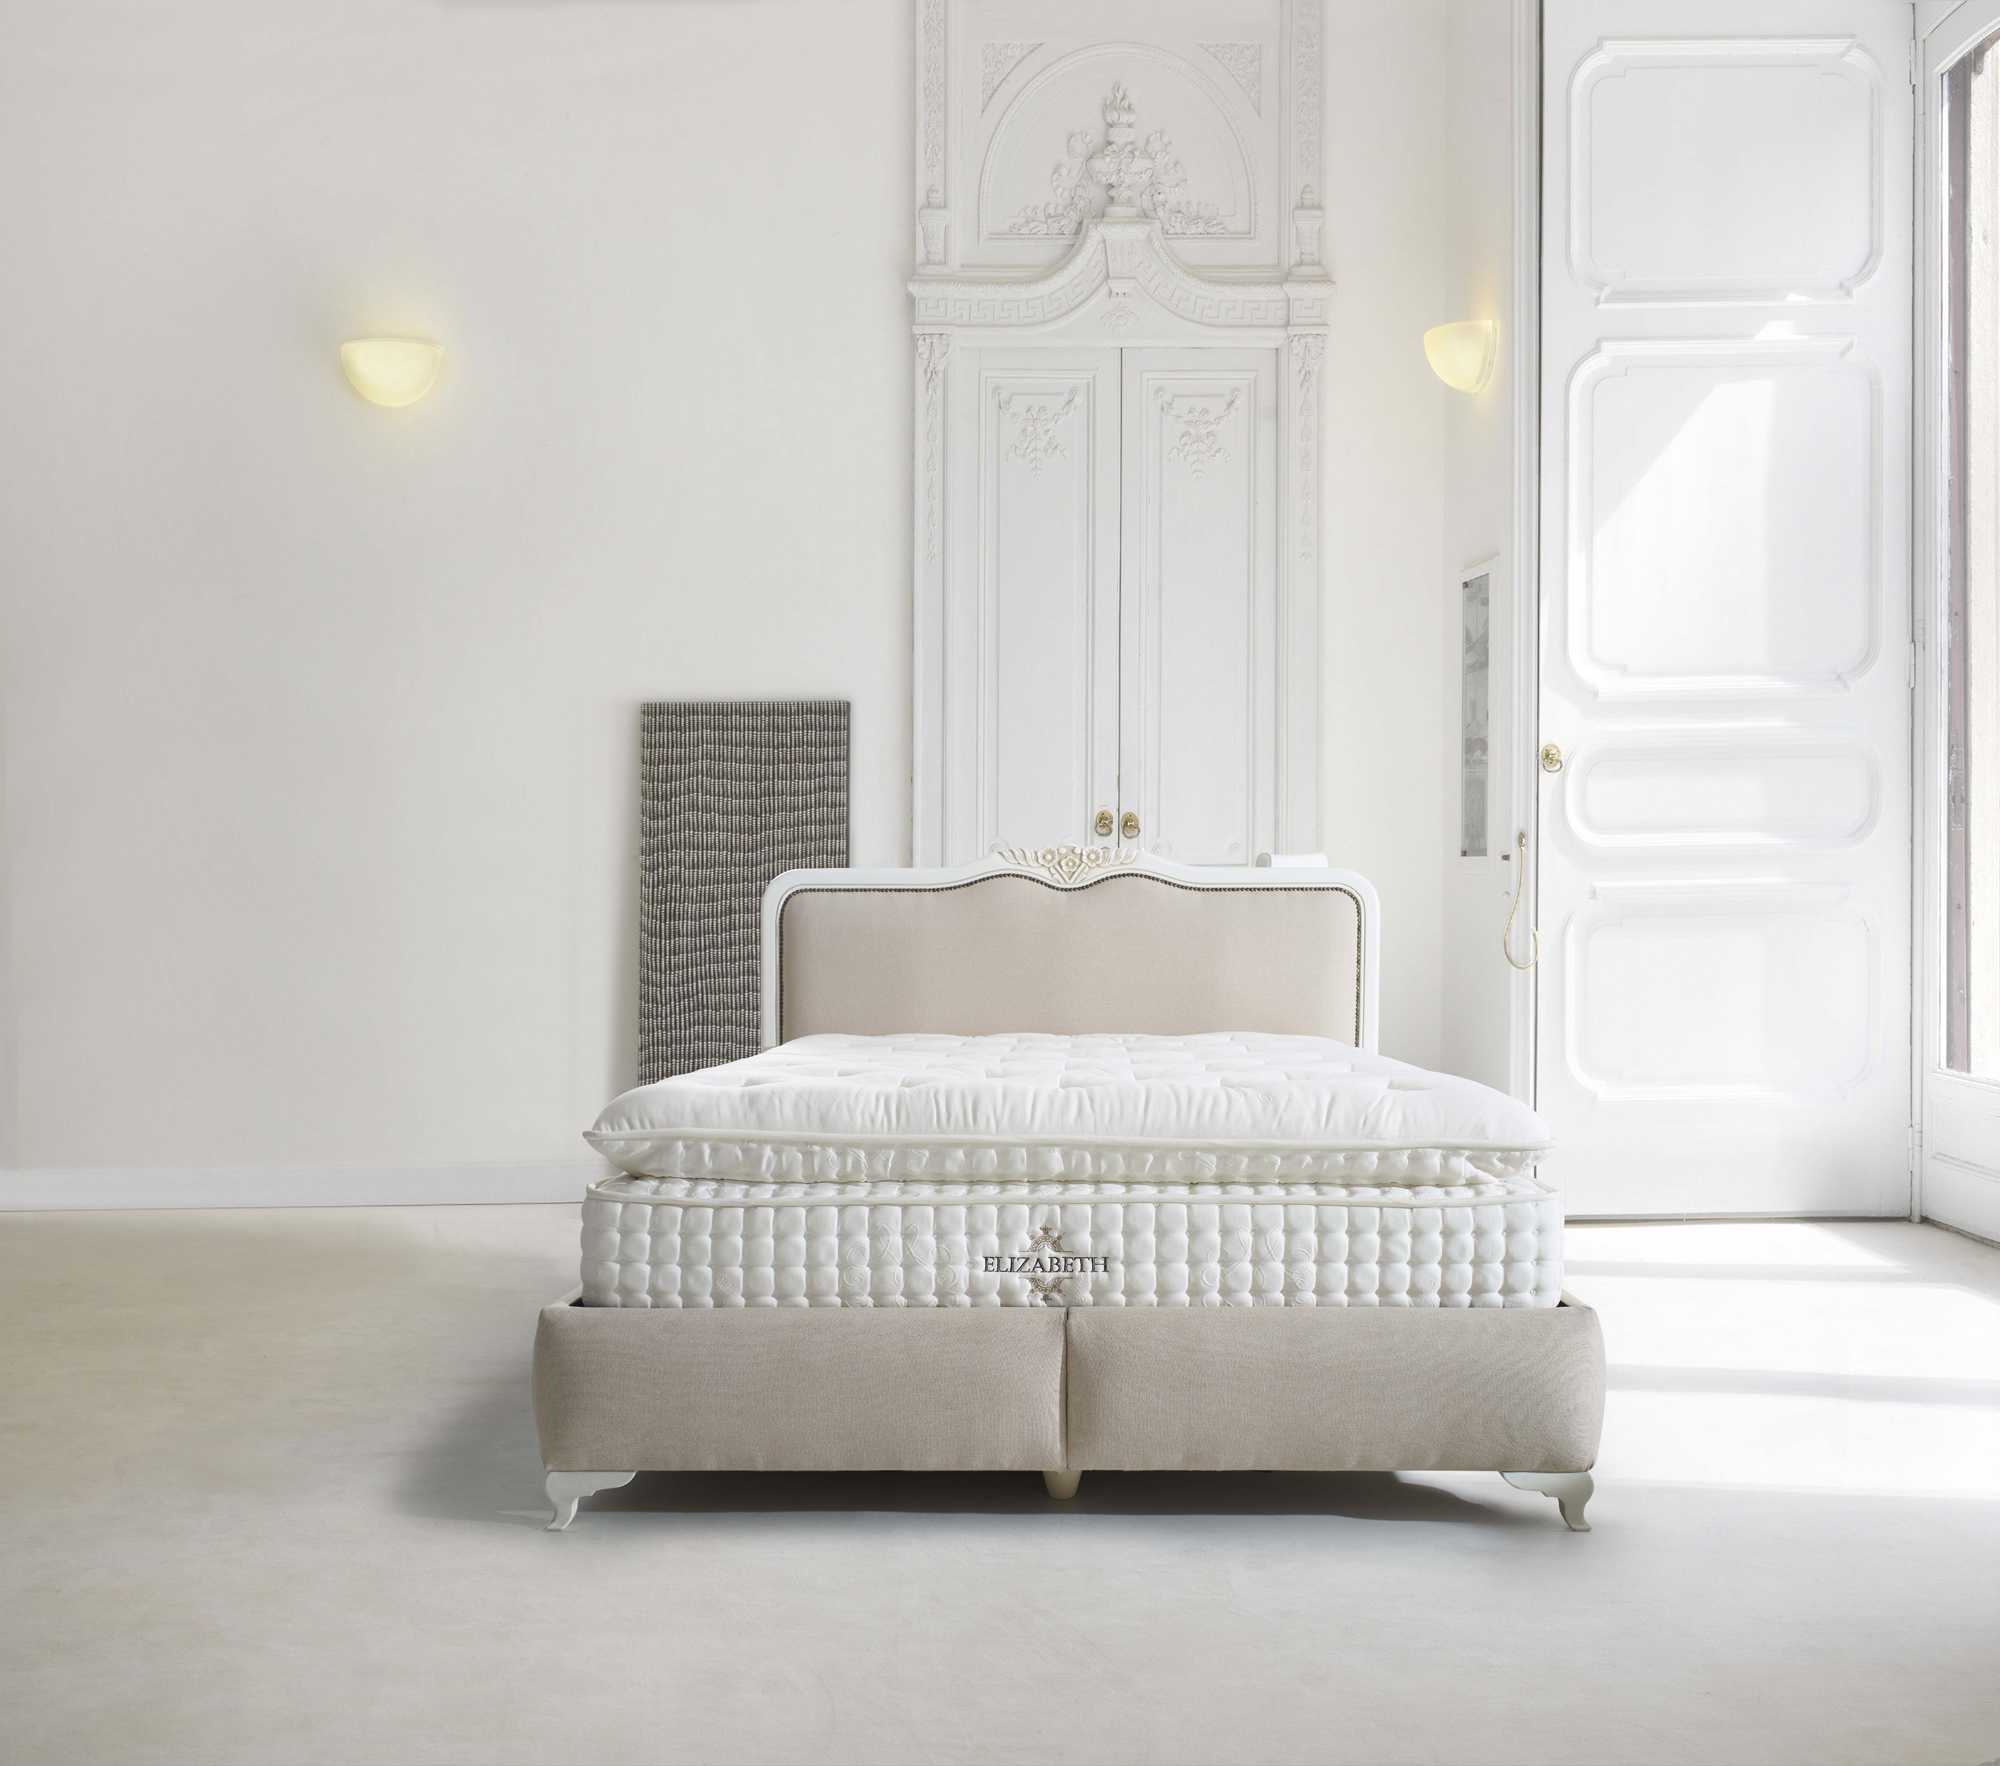 elizabeth otantic baza bett set yuvam m belhaus in wuppertal cilek offizieller h ndler in europa. Black Bedroom Furniture Sets. Home Design Ideas